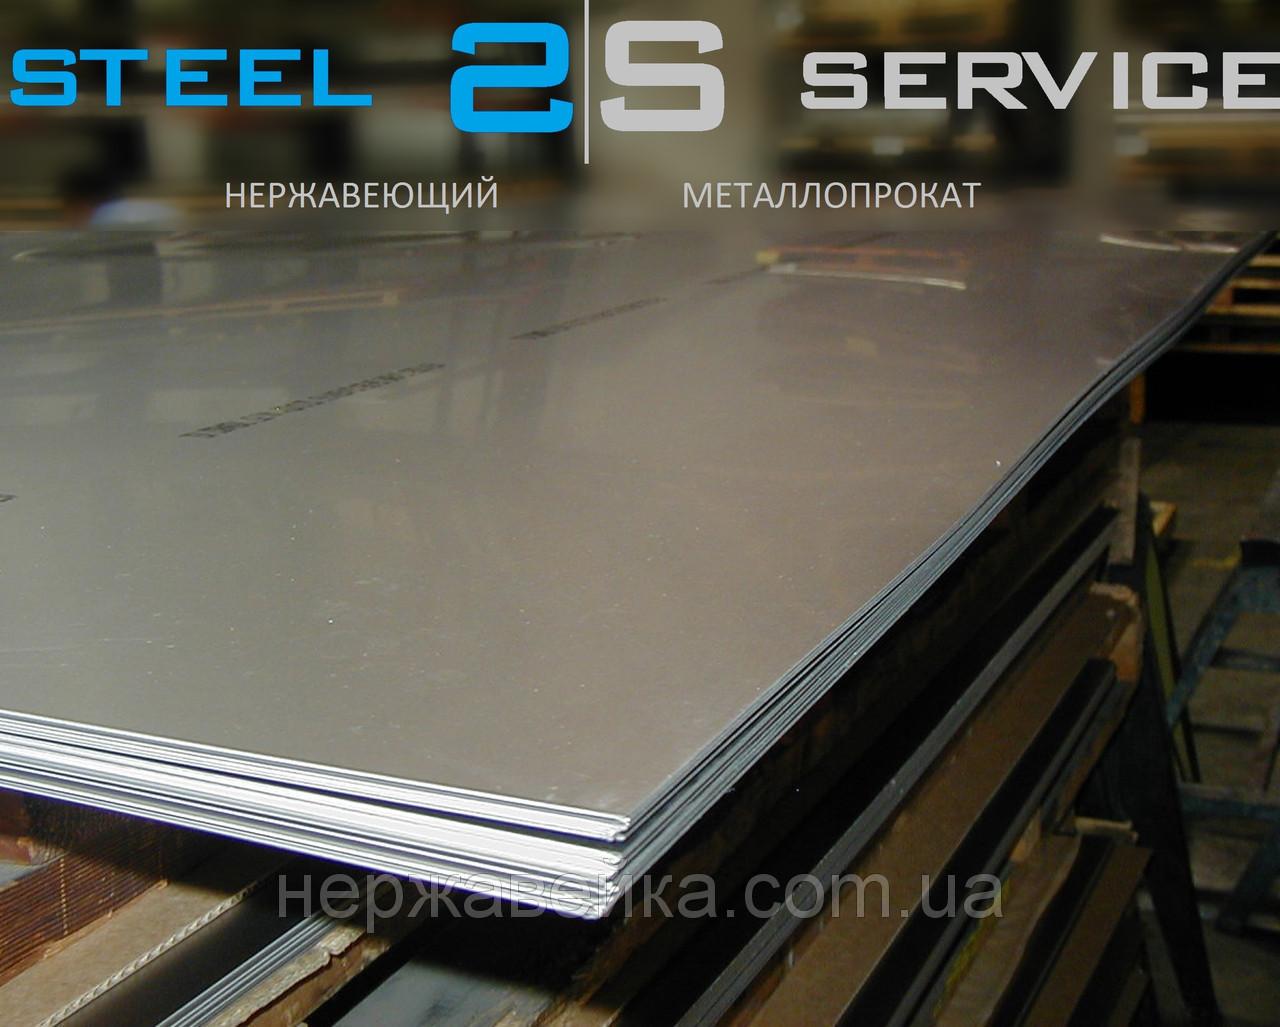 Нержавеющий лист 0,4х1000х2000мм AISI 316L(03Х17Н14М3) 4N - шлифованный, кислотостойкий